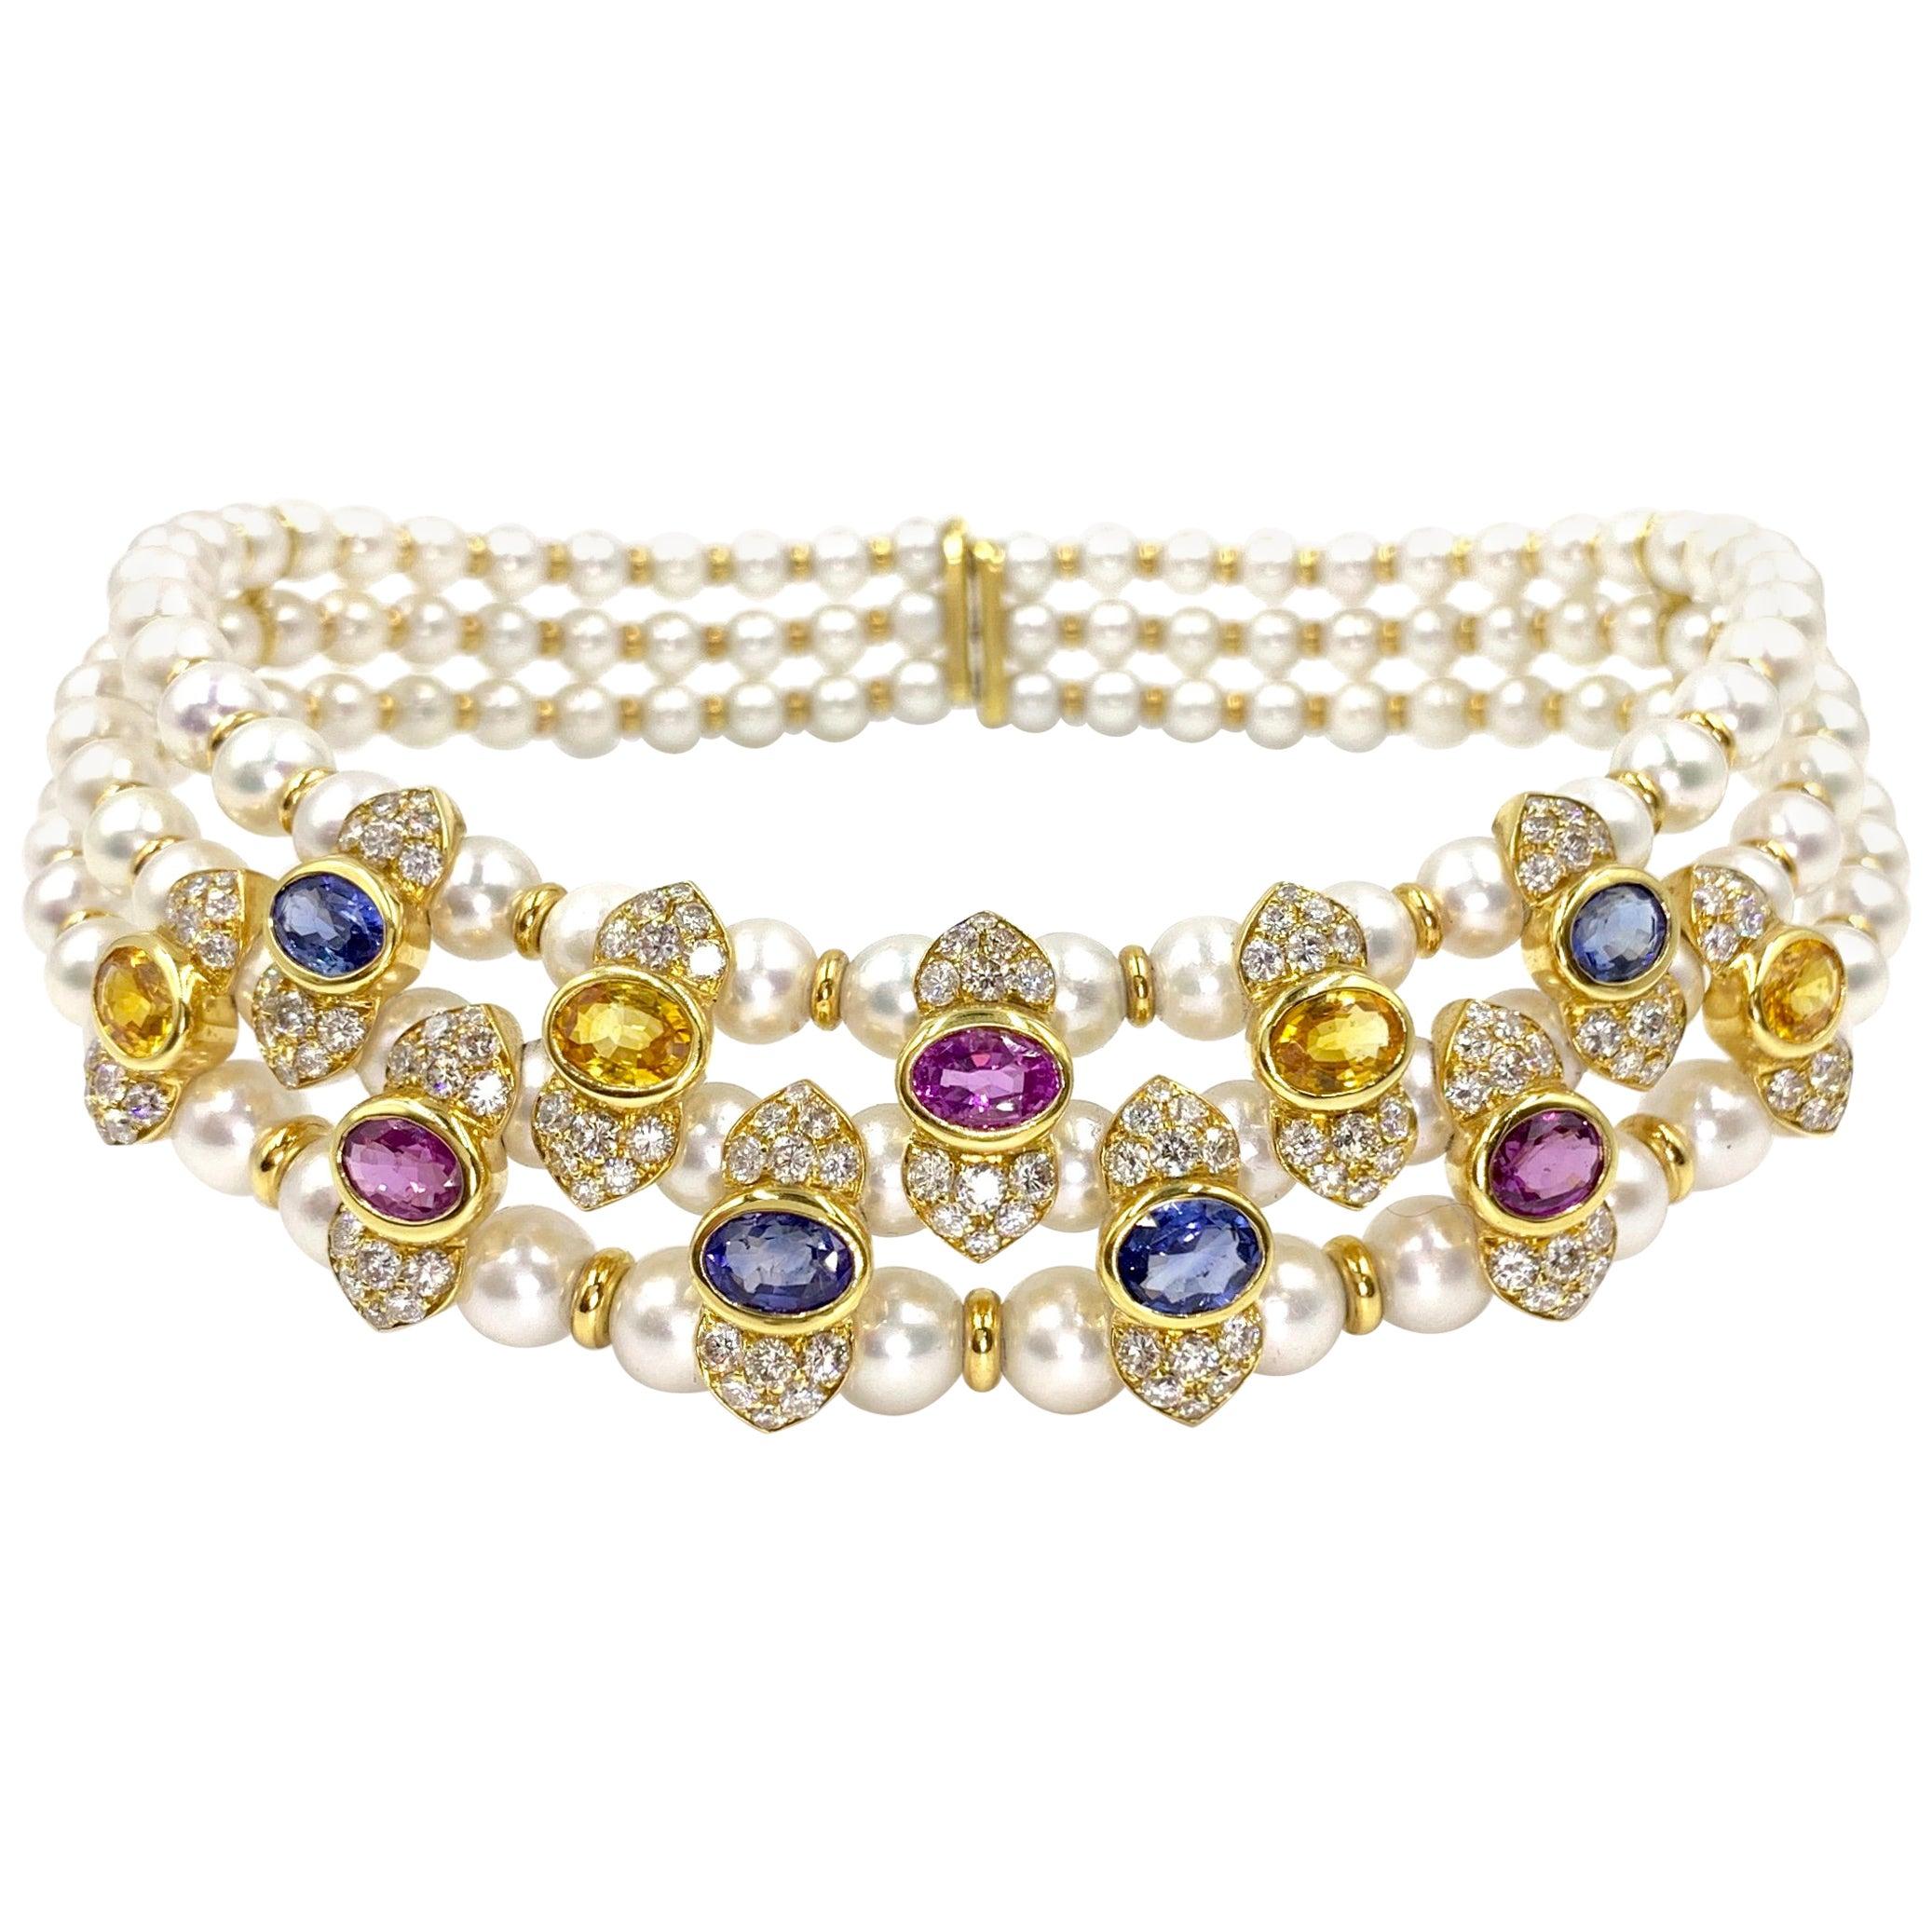 18 Karat Victorian Inspired Pearl, Sapphire and Diamond Choker Necklace